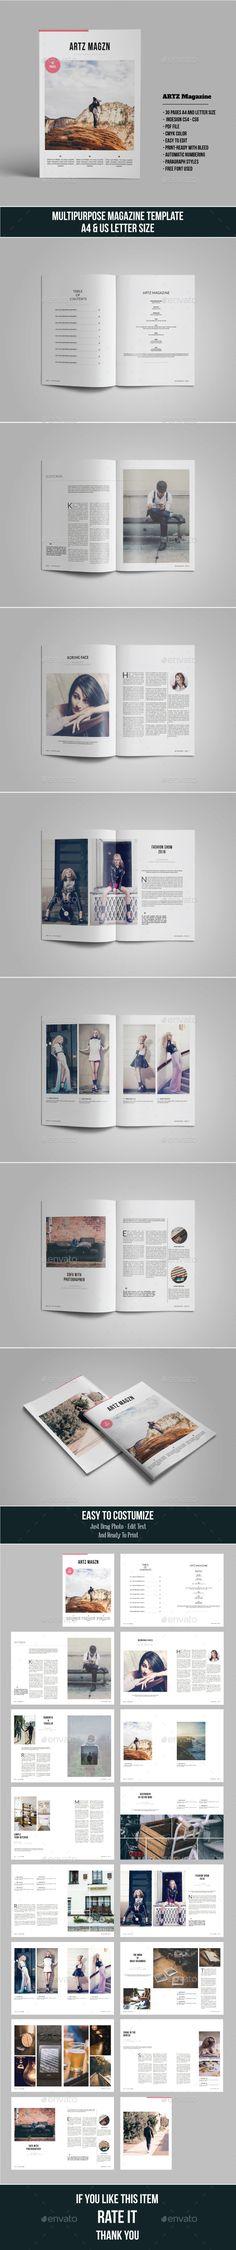 ARTZ Magazine #architecture #professional Download : https://graphicriver.net/item/artz-magazine/15021195?ref=pxcr